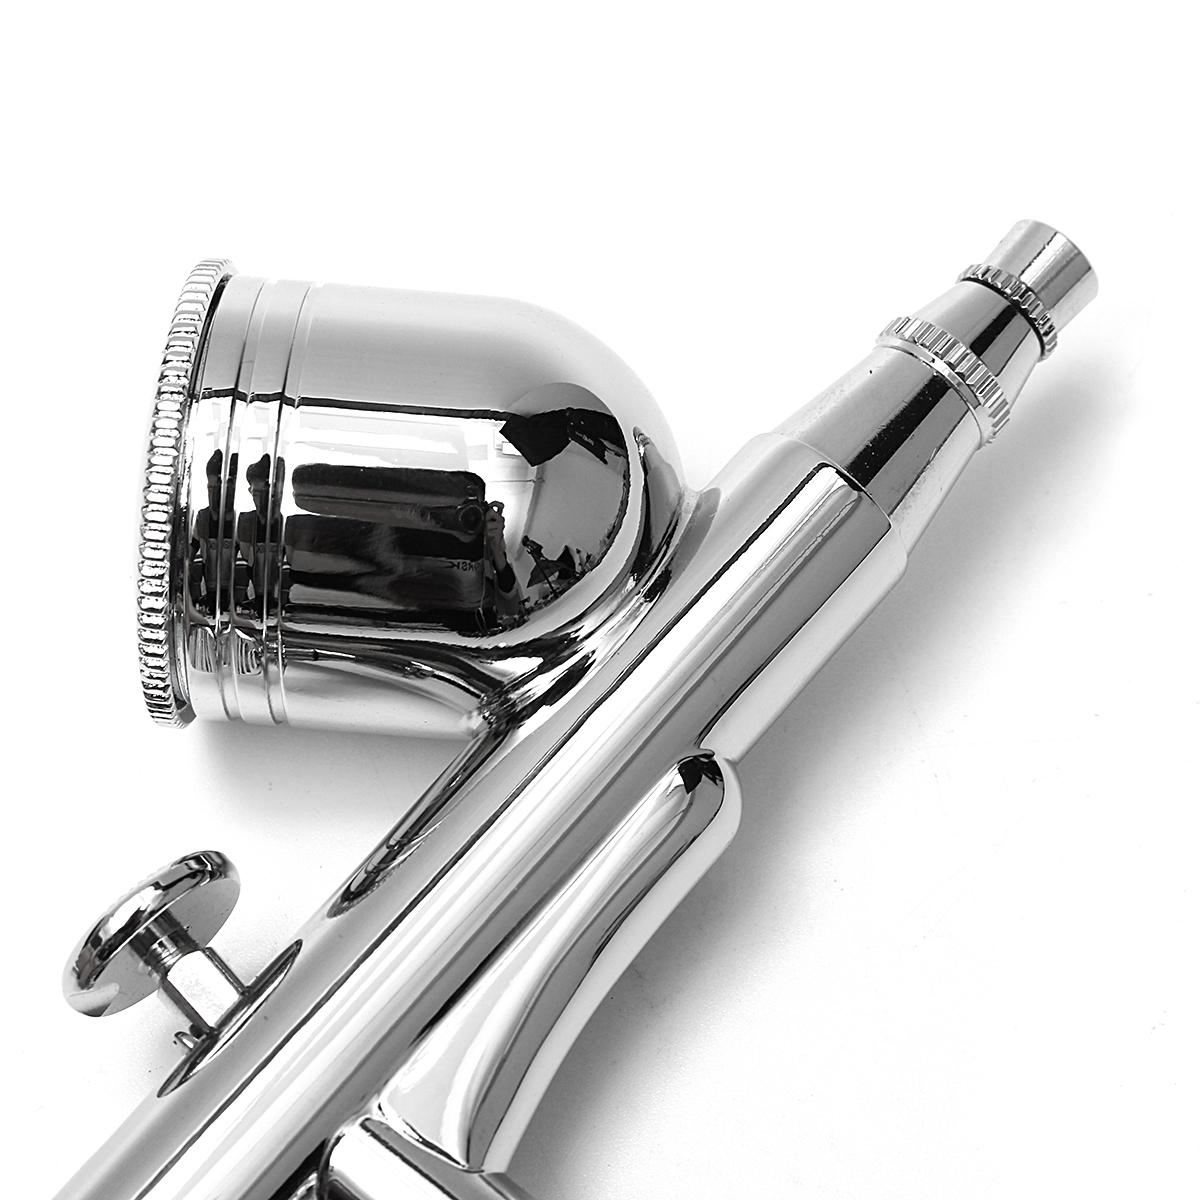 T130K Dual-Action Airbrush 0.2/0.5mm 7CC Gravity Feed Air Brush Spray Gun Paint Kit